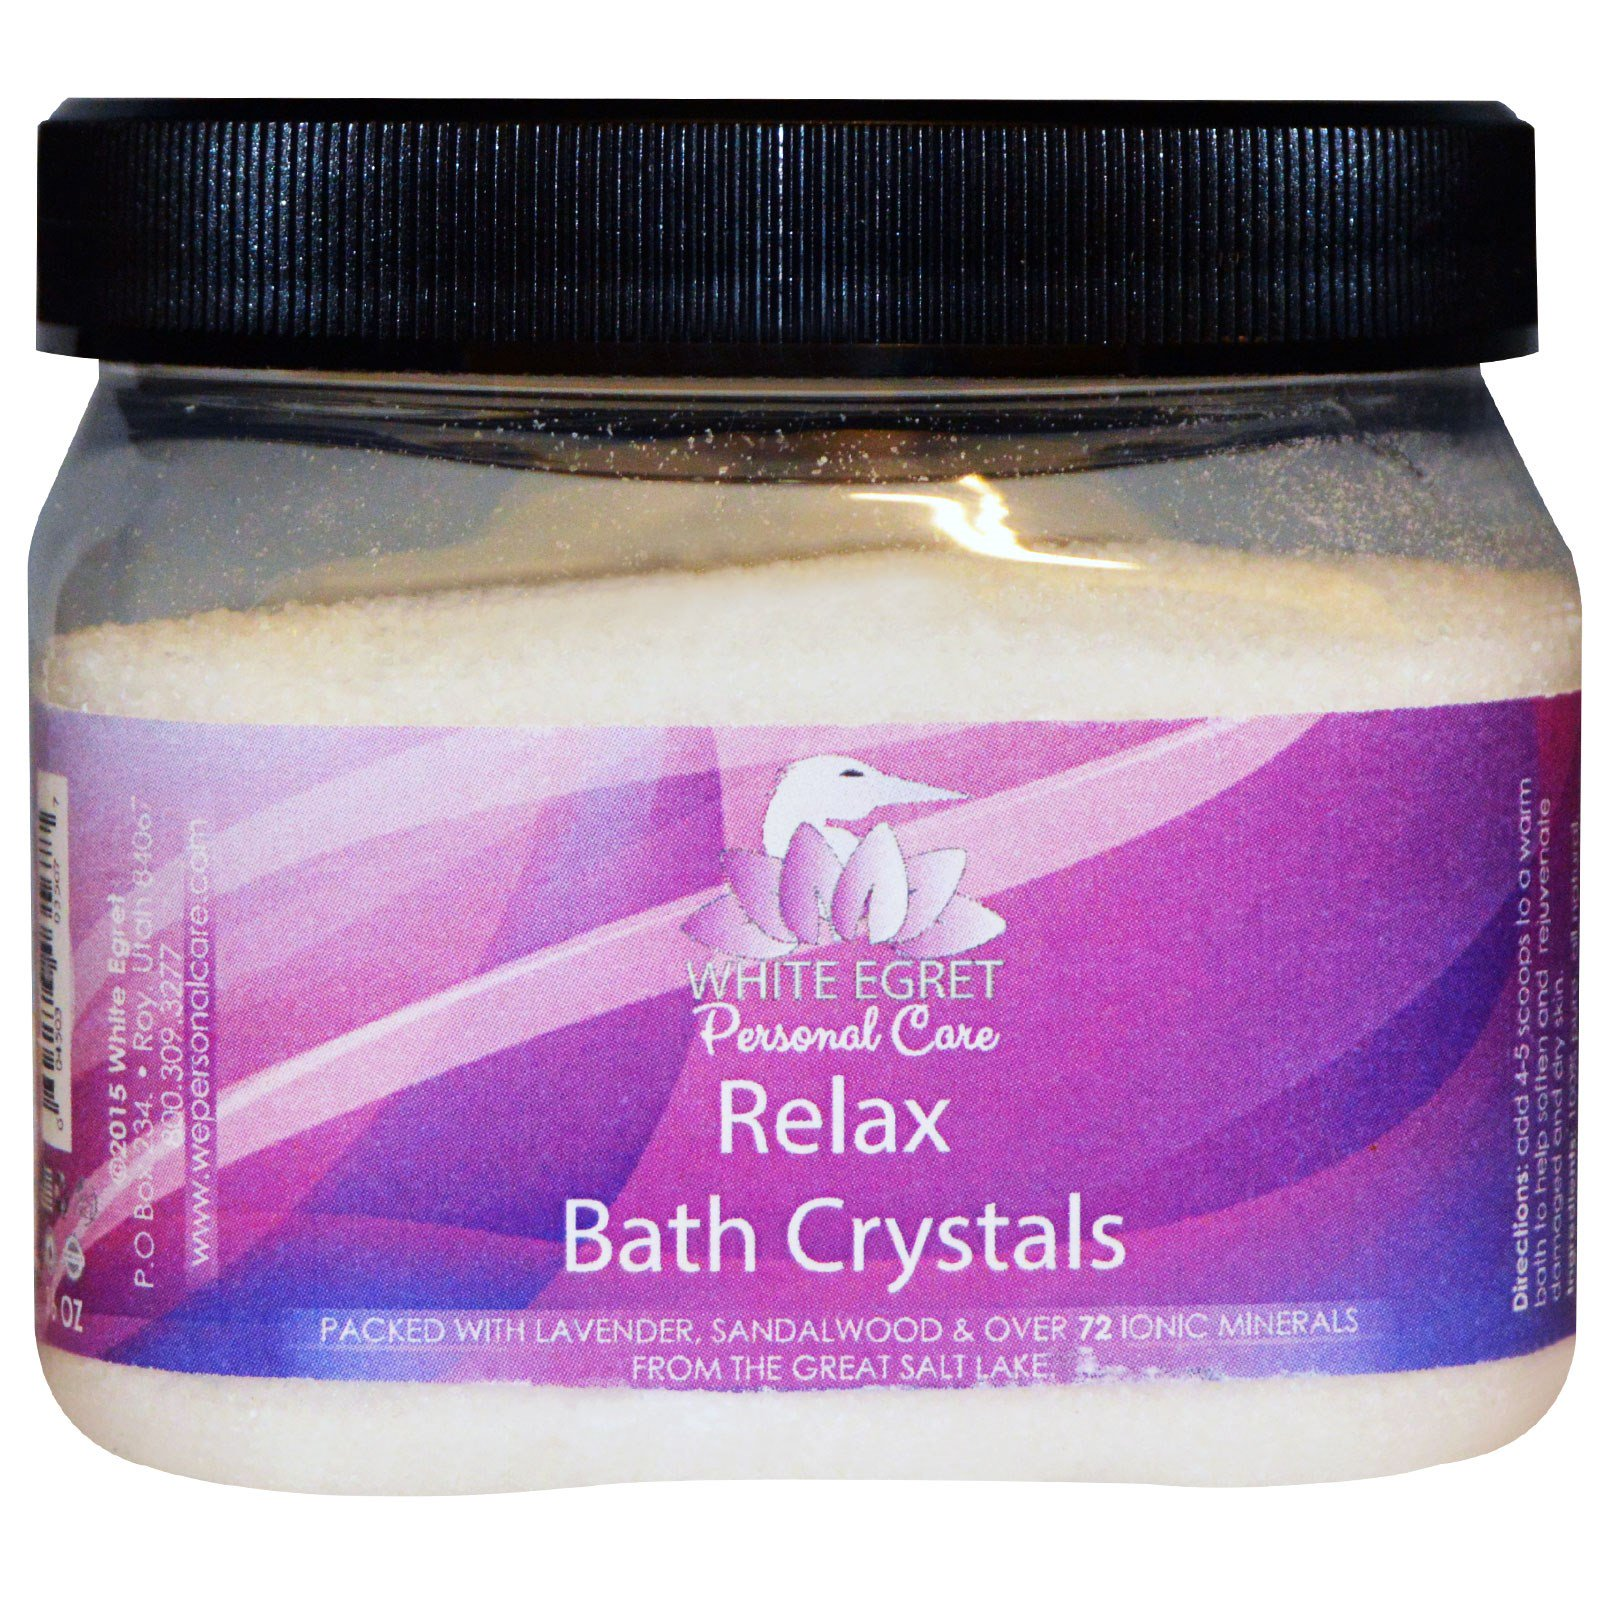 Other Bath & Body Supplies The Best Bath Crystals Relax 16 Oz By White Egret Bath & Body